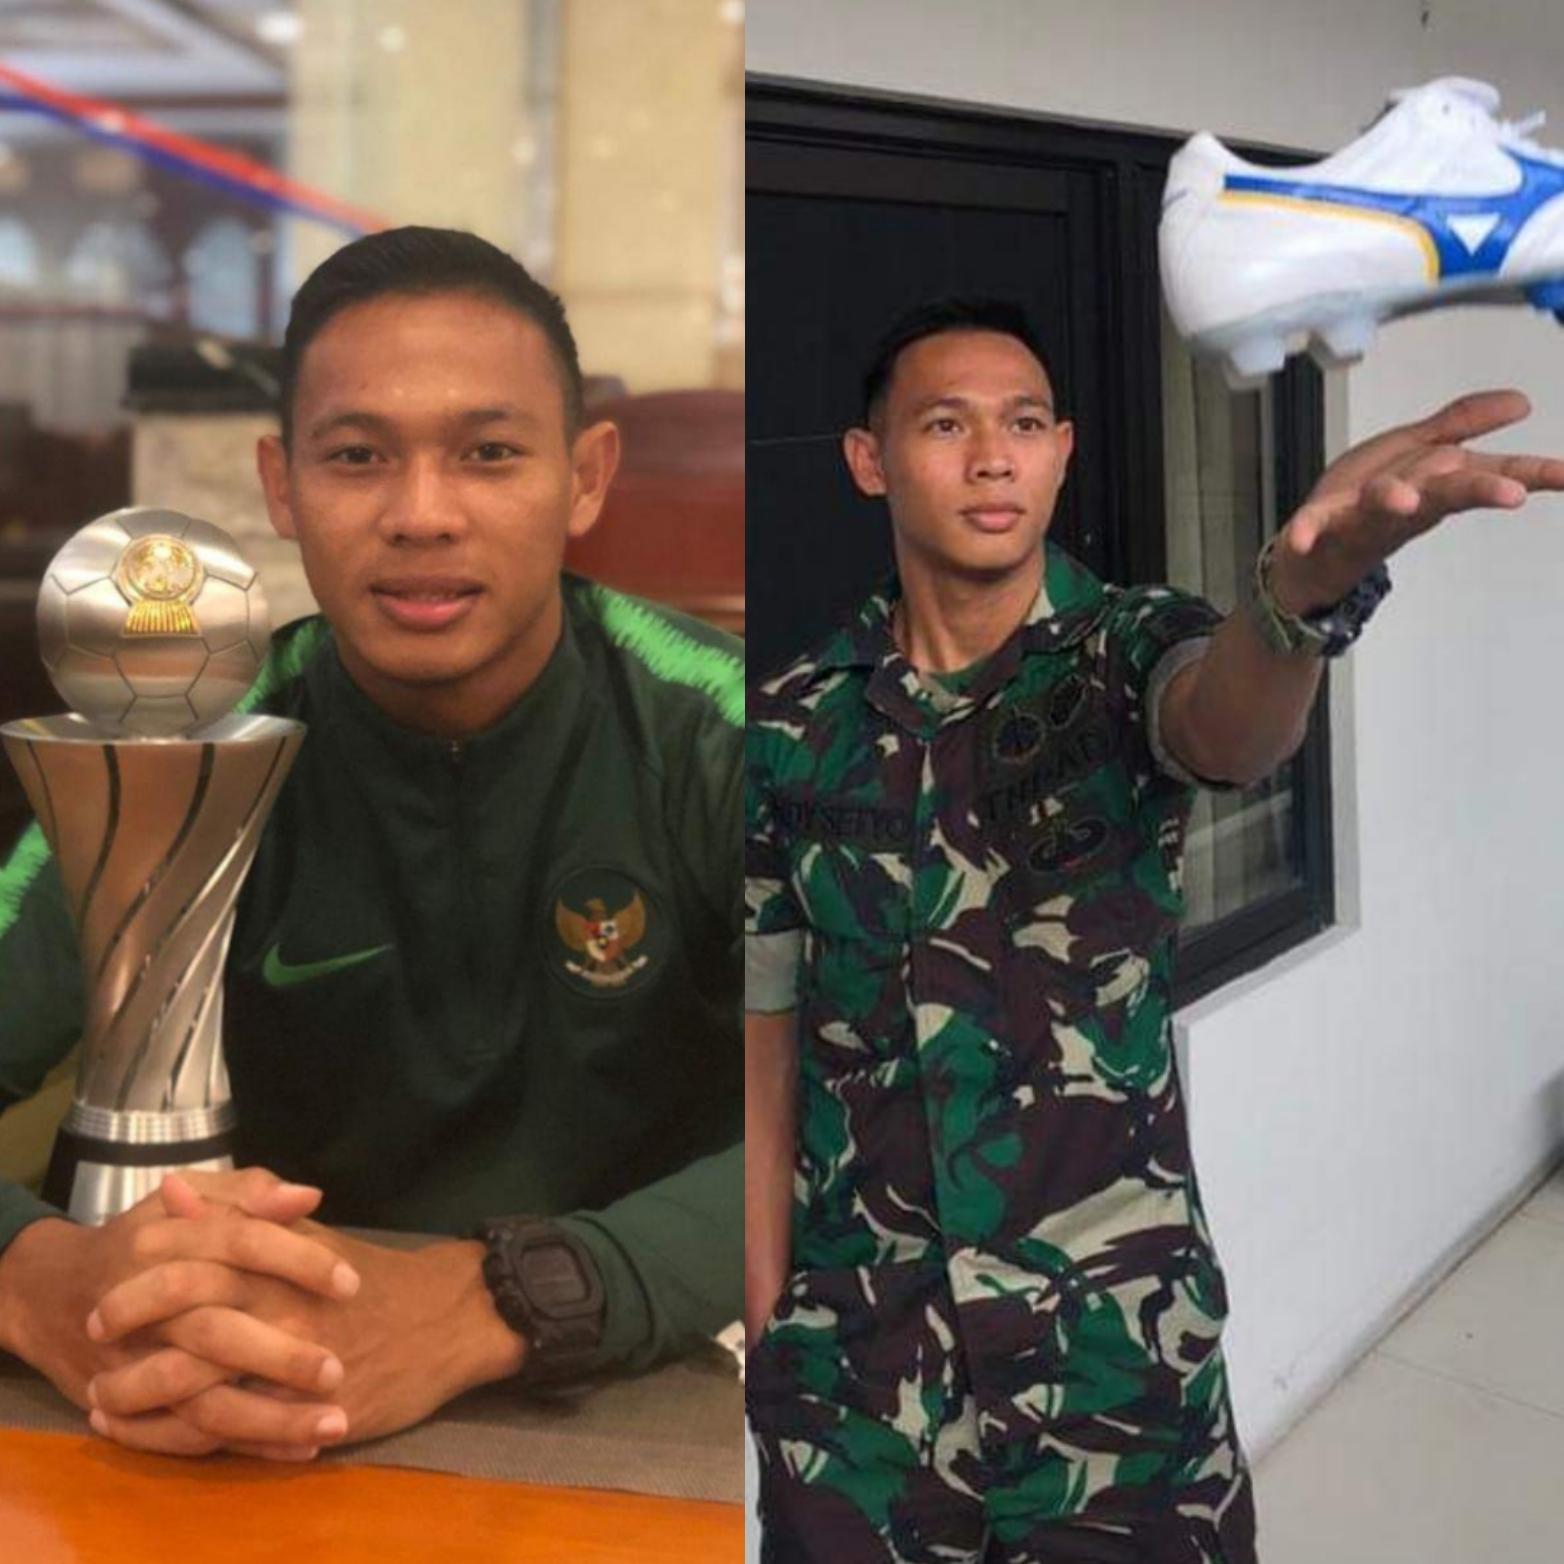 Prajurit Kostrad Jadi Kapten Timnas Timnas U-22 dan Menjuarai Piala AFF 2019